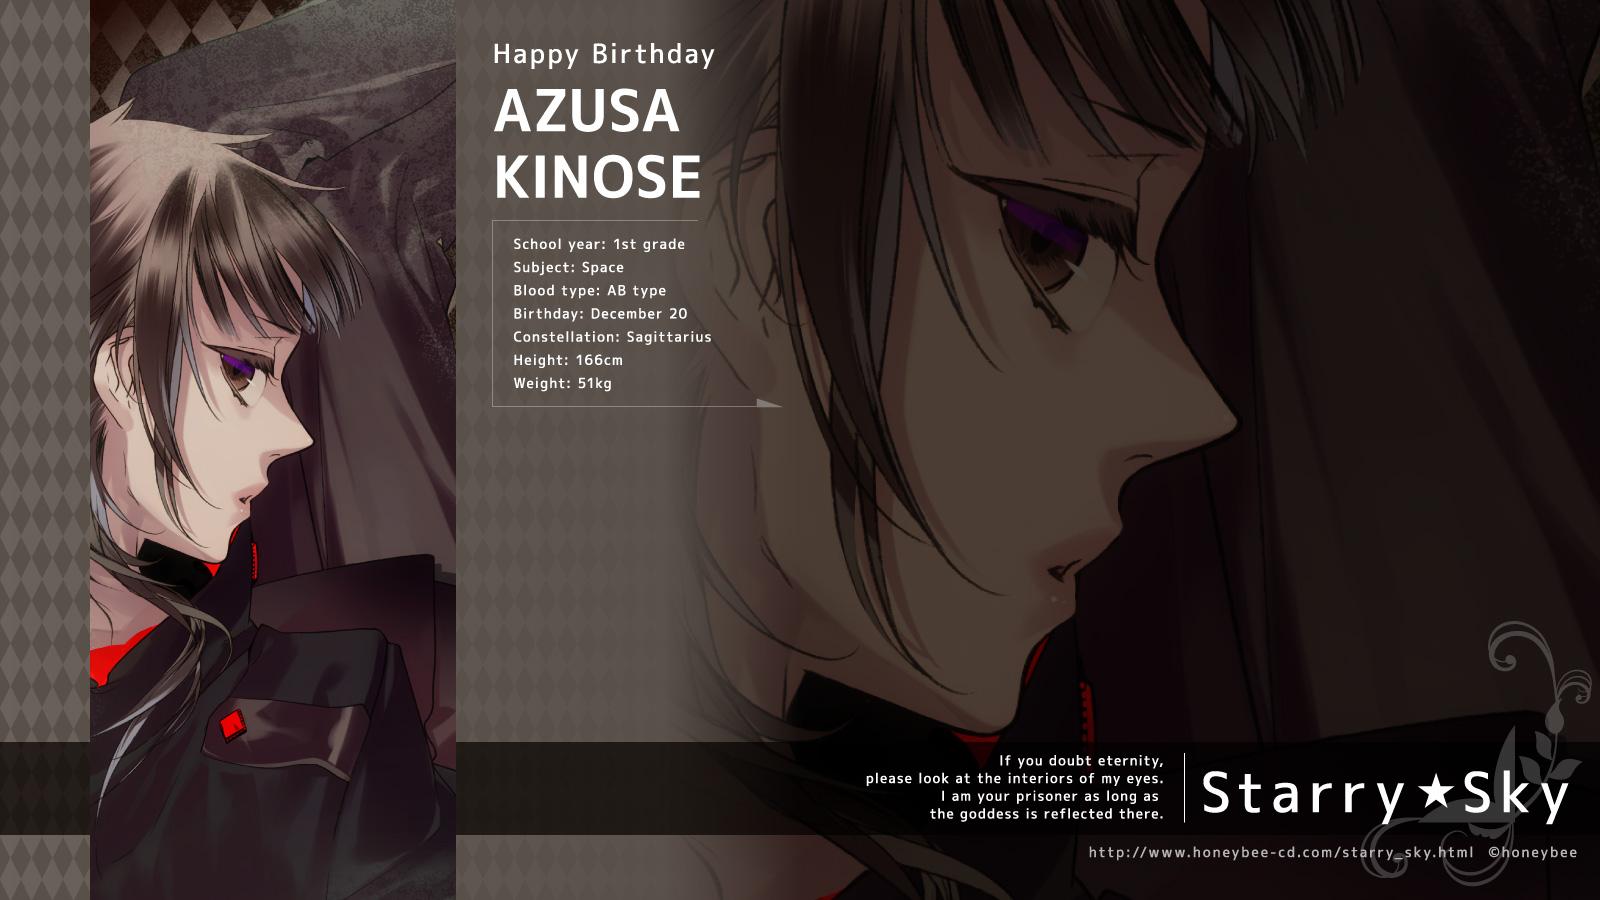 Anime Characters Born June 9 : Starry☆sky~ kazuaki wallpaper zerochan